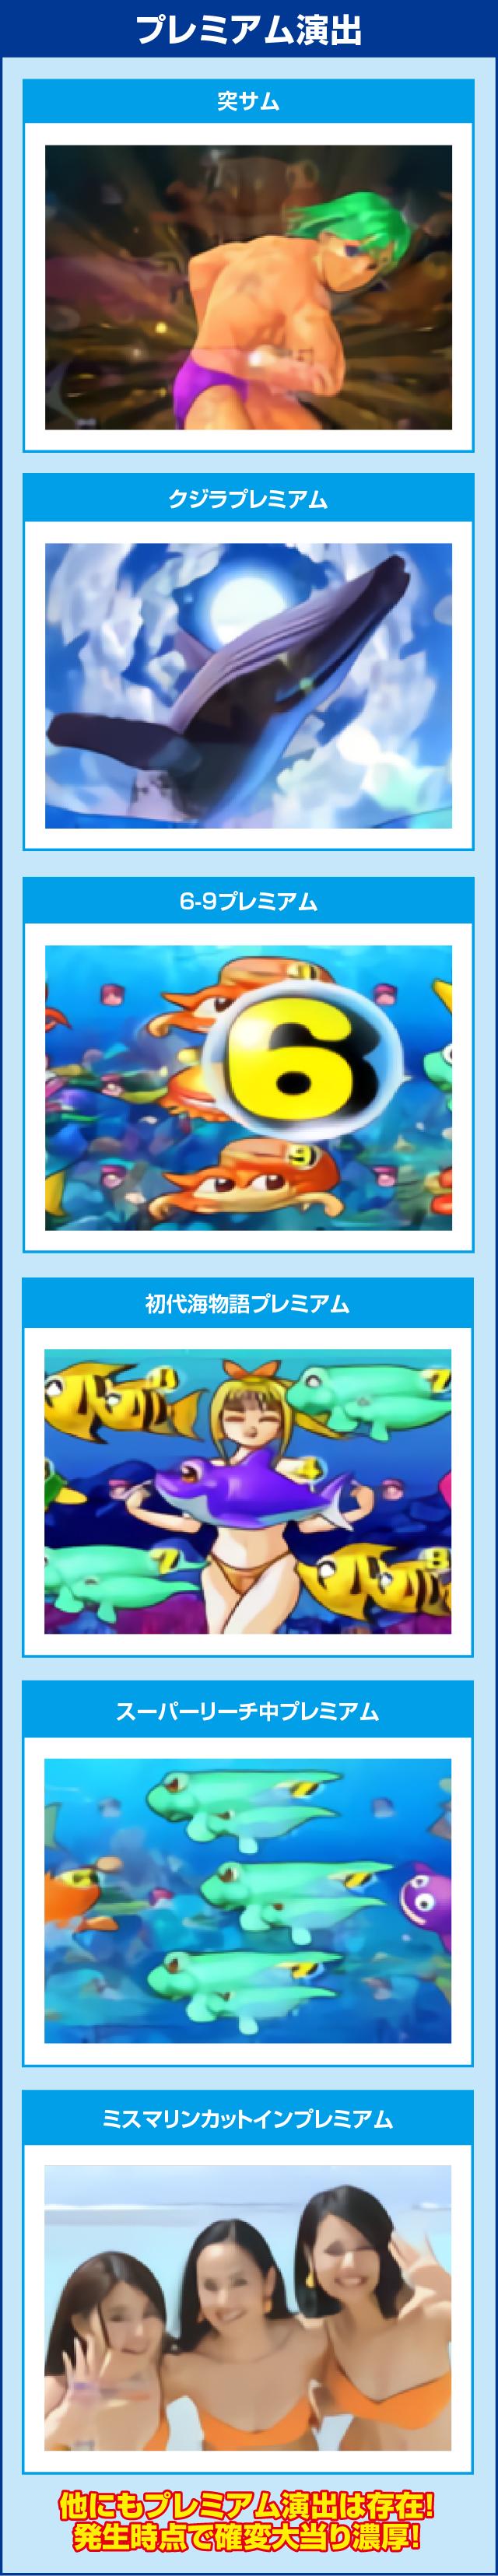 CRスーパー海物語IN沖縄4のピックアップポイント